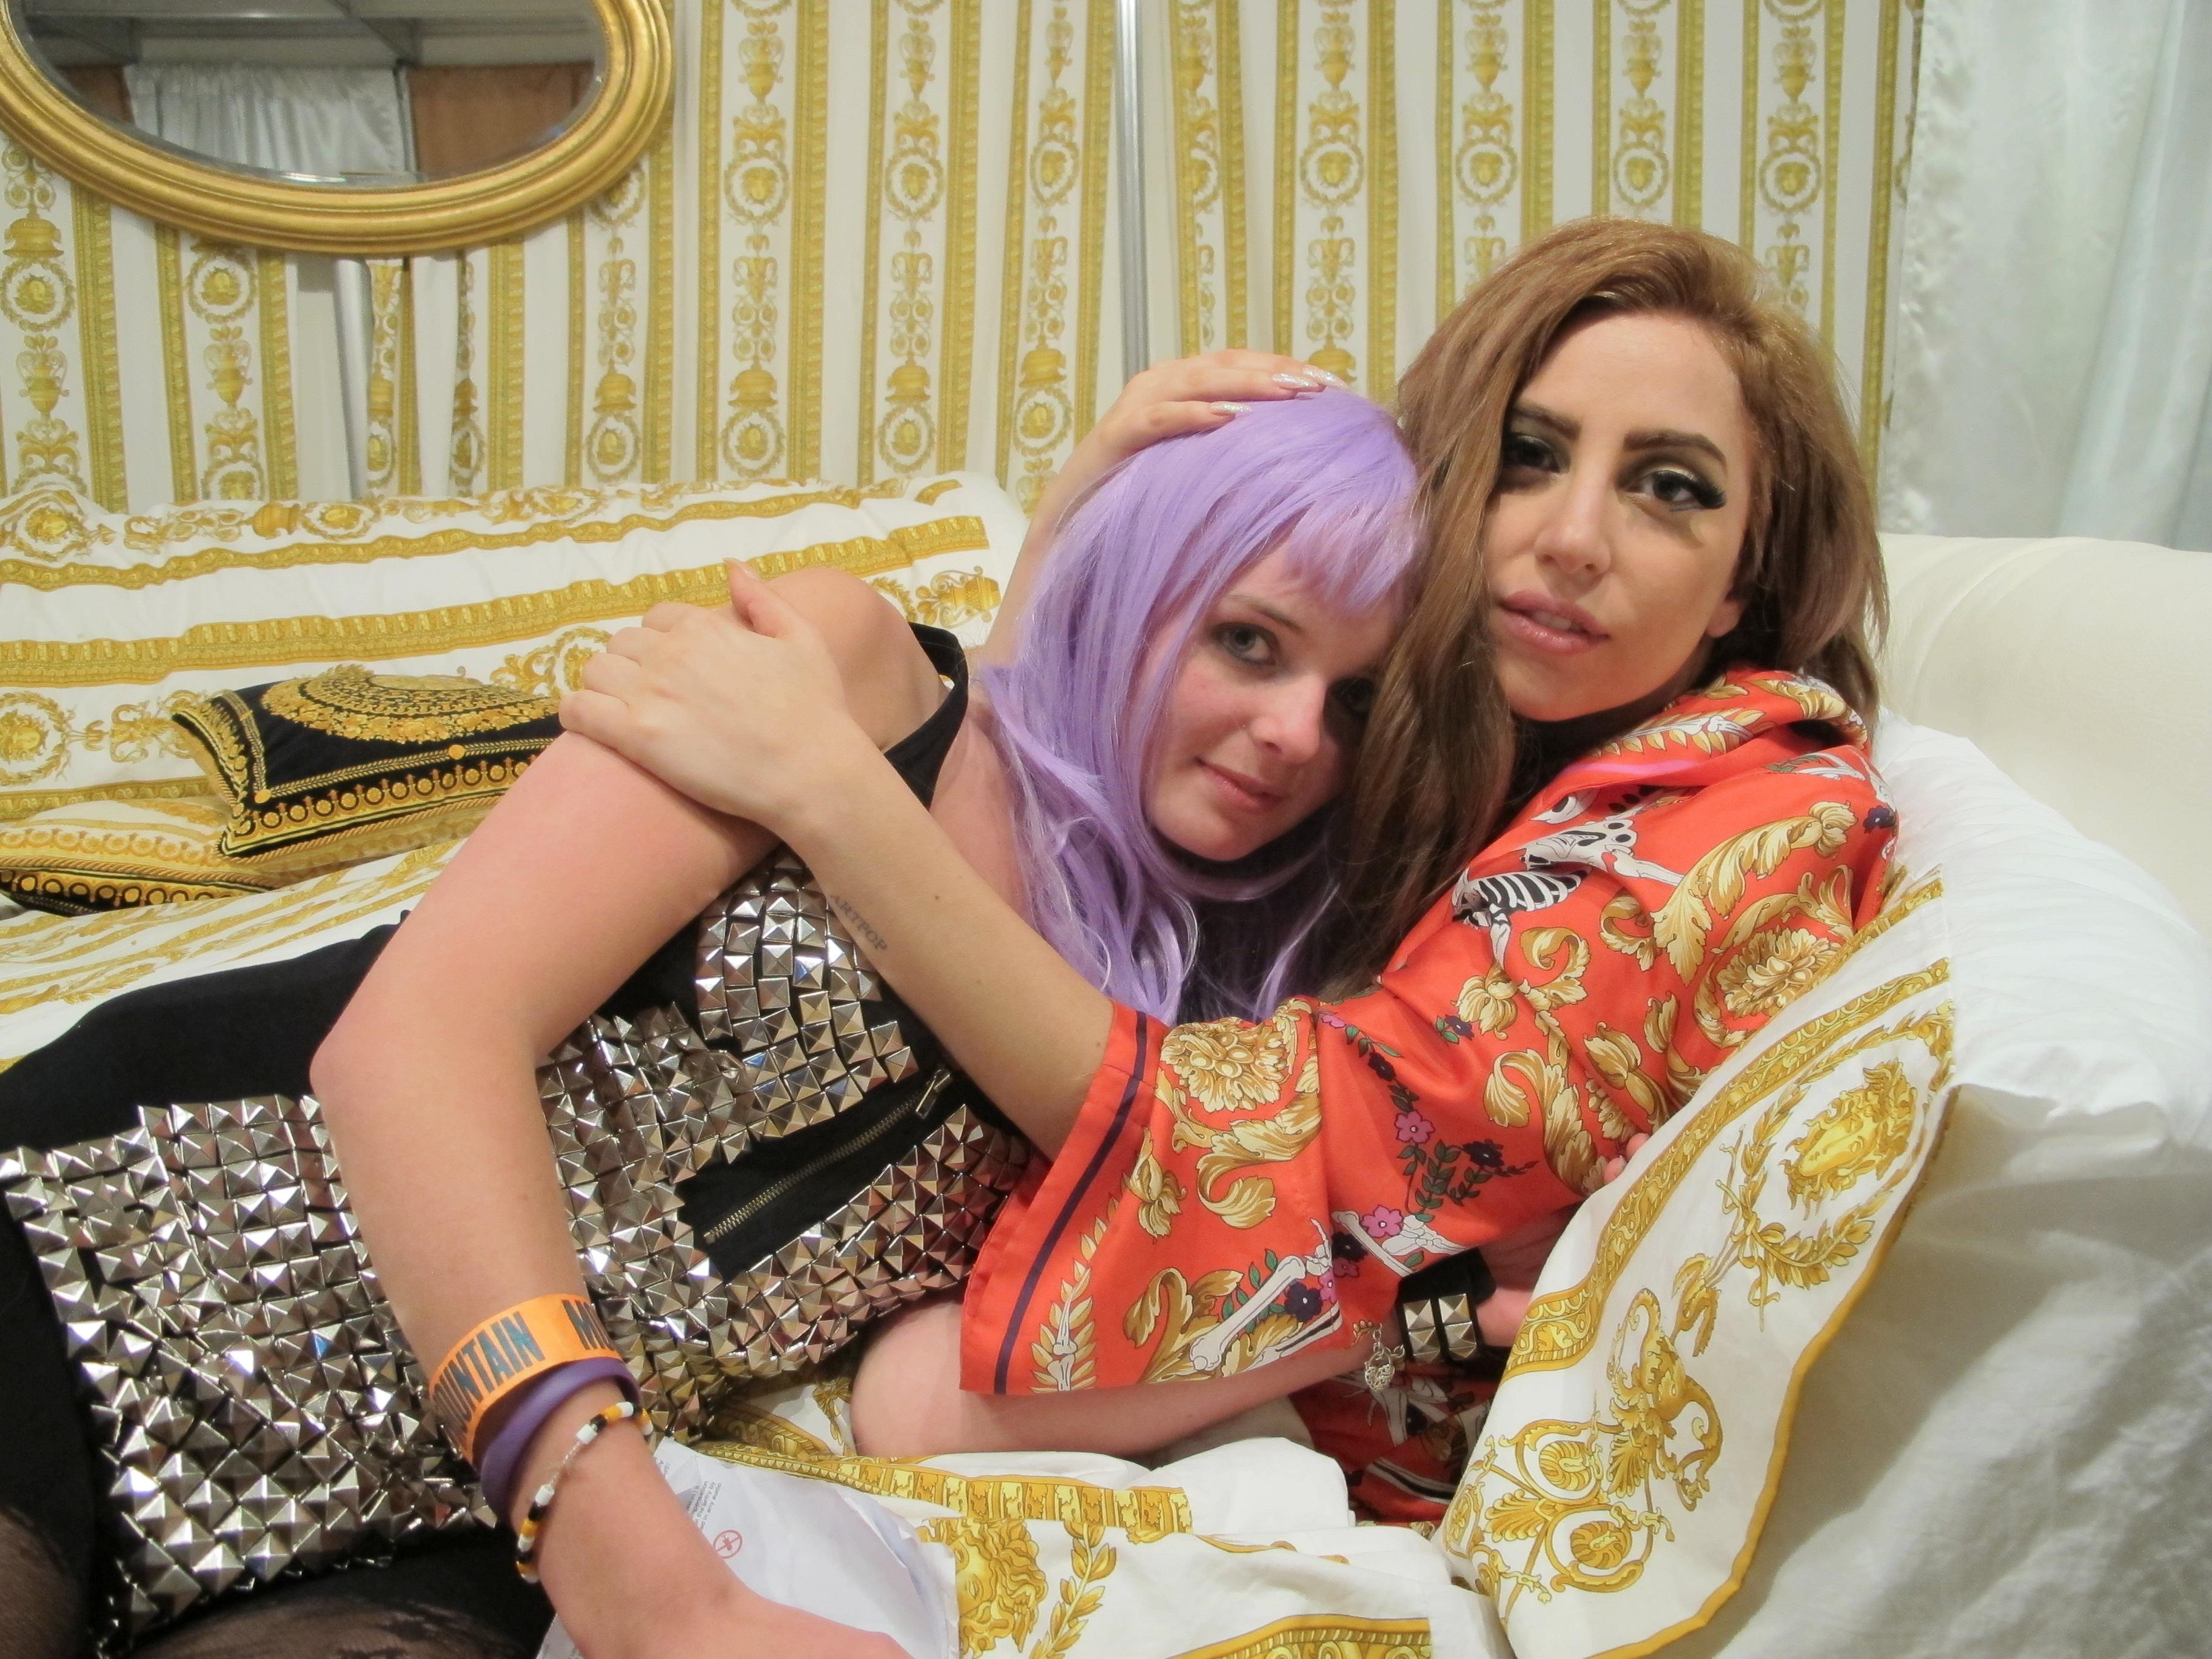 August 21 Through The Years Gaga Thoughts Gaga Daily